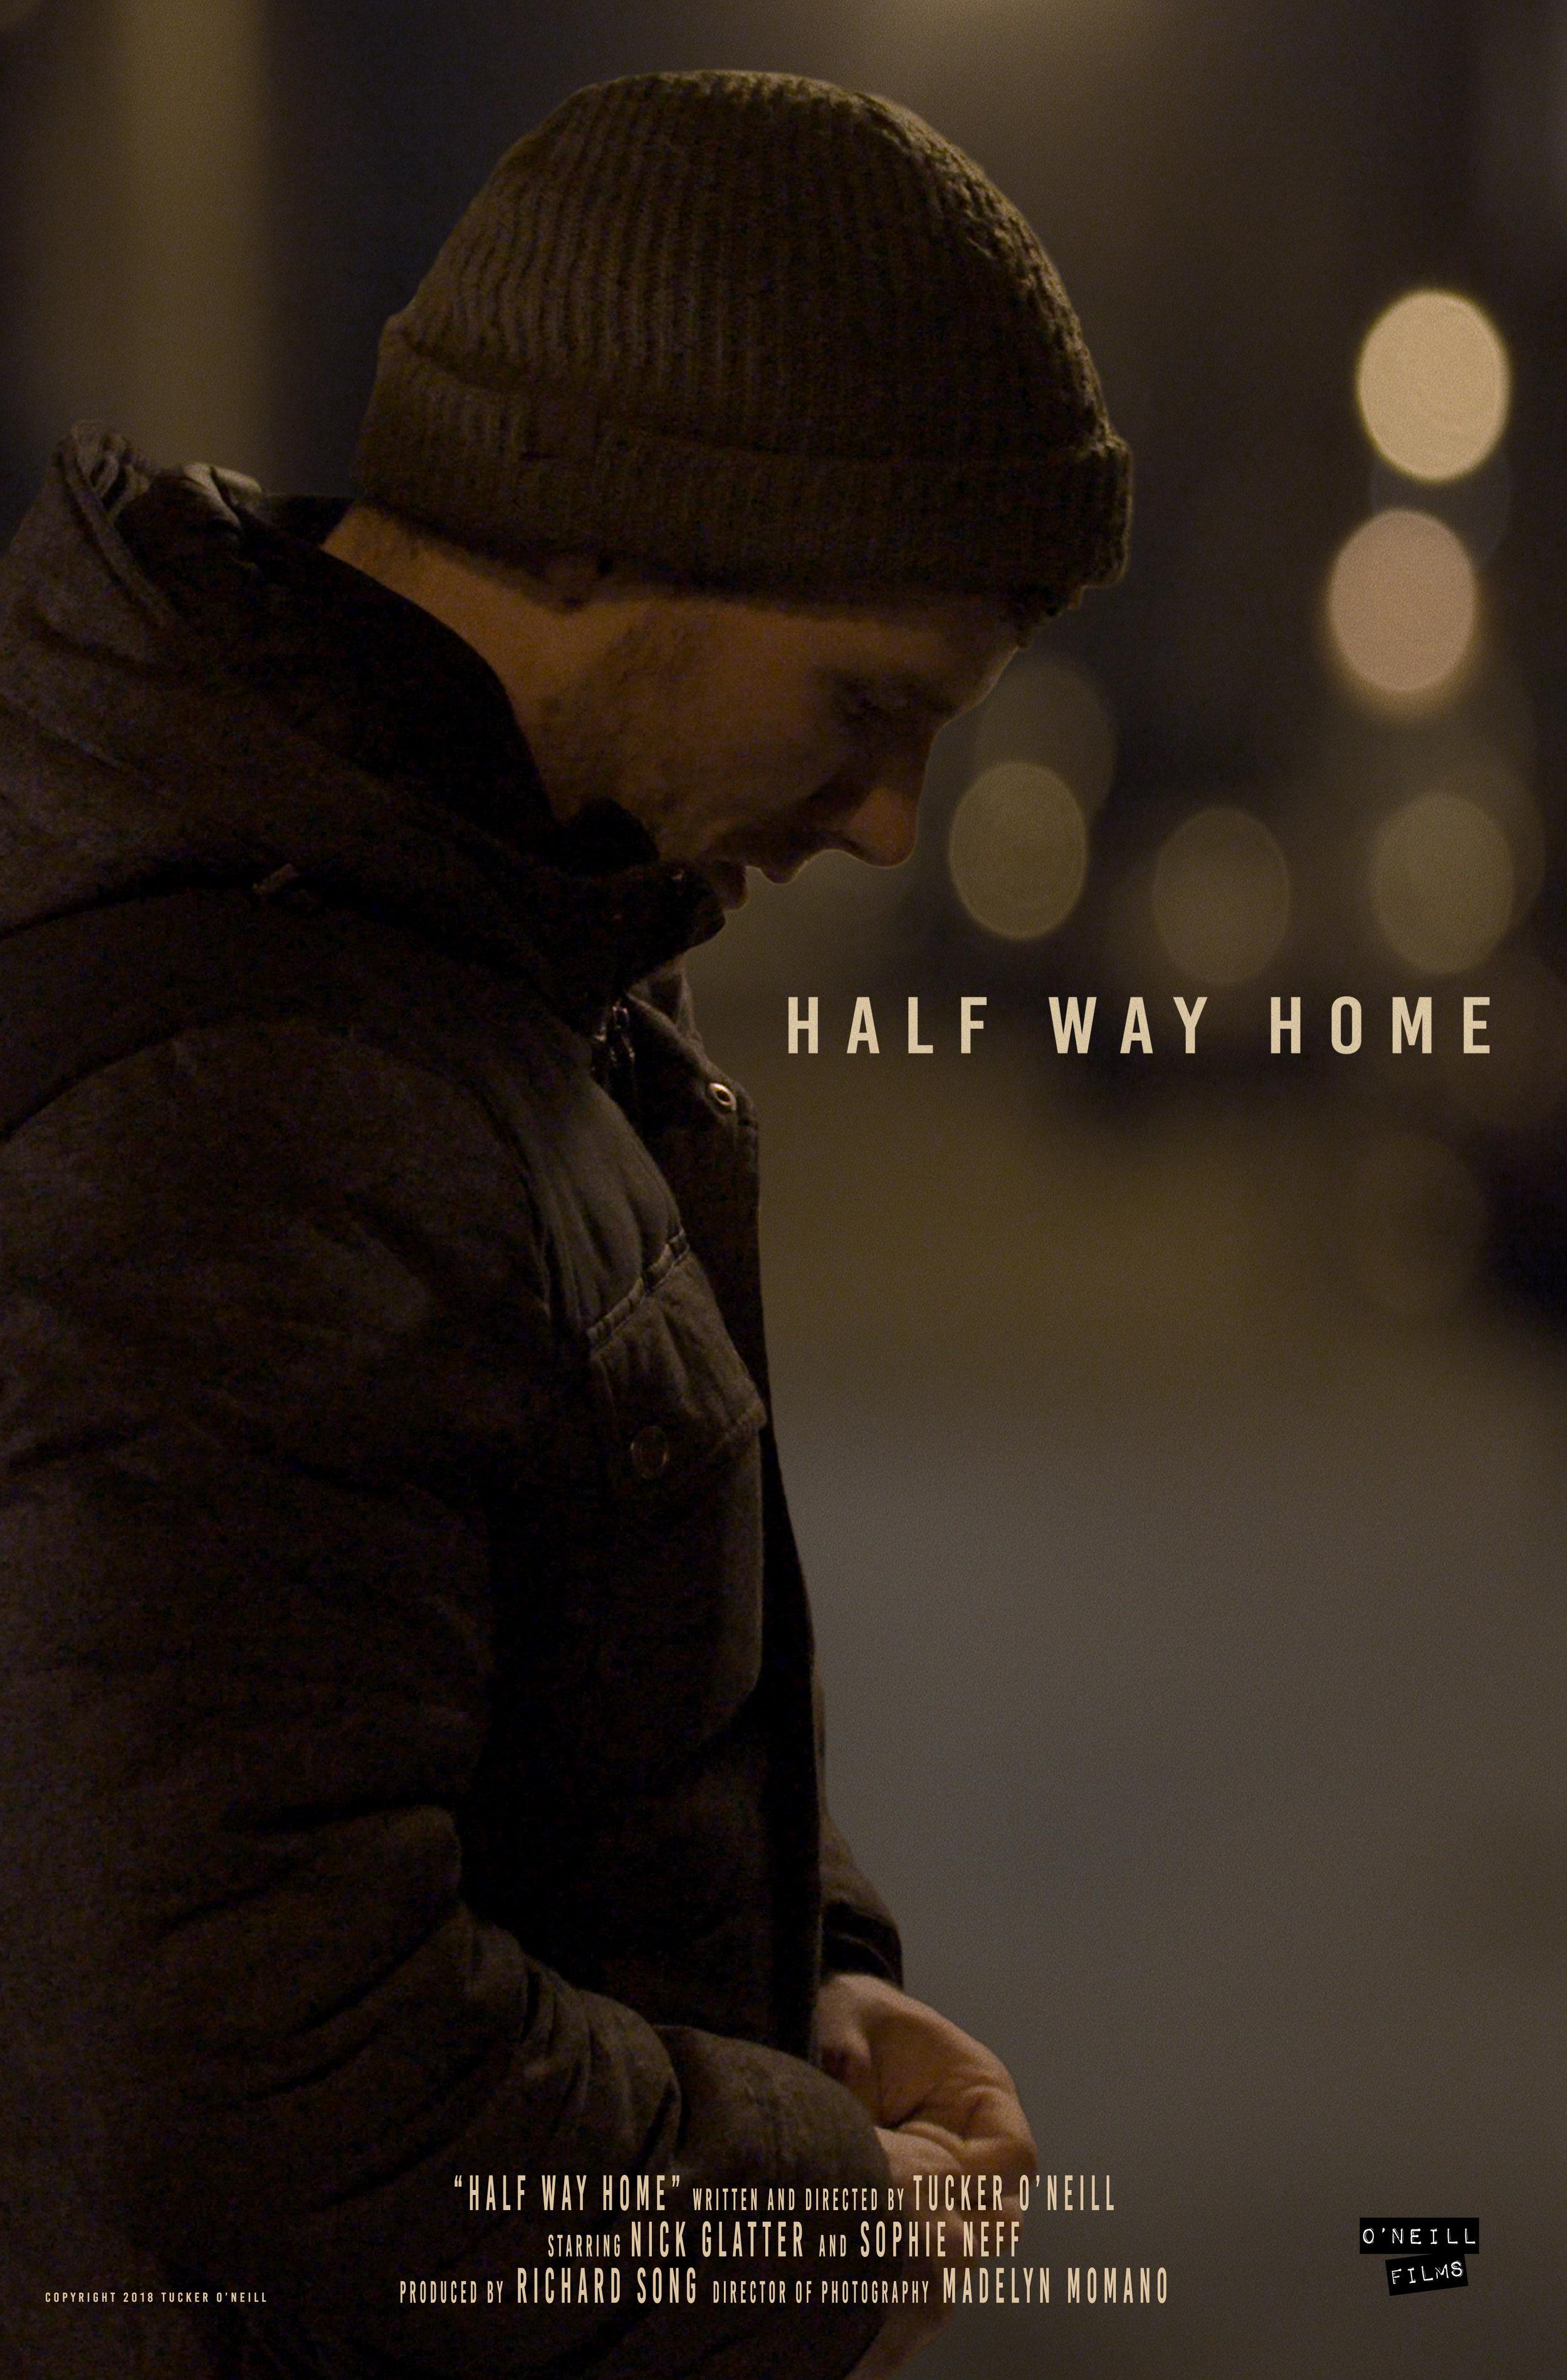 Half Way Home Poster.jpg